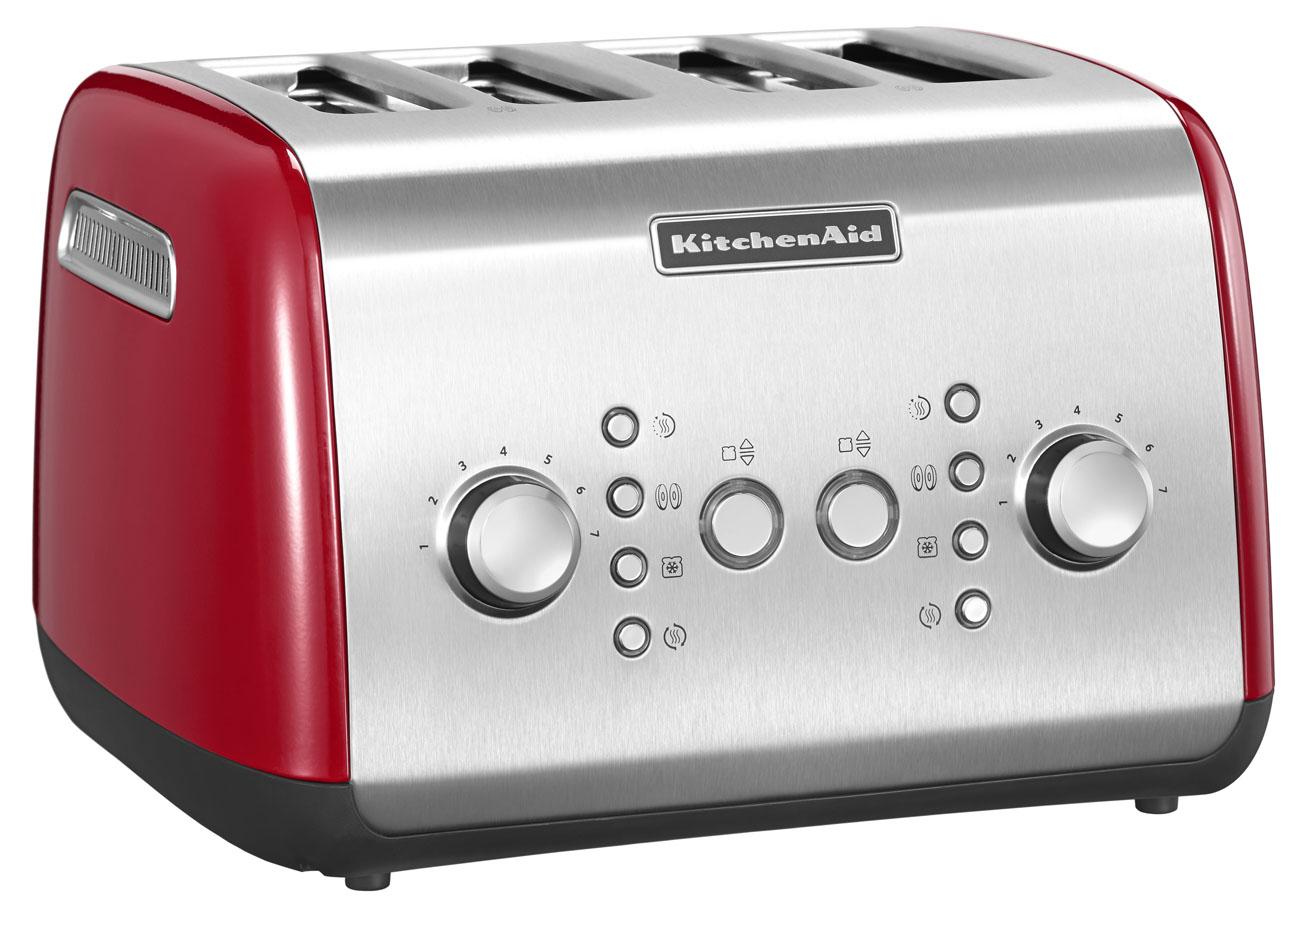 kitchenaid toaster 2 ger te f r 2 oder 4 scheiben. Black Bedroom Furniture Sets. Home Design Ideas